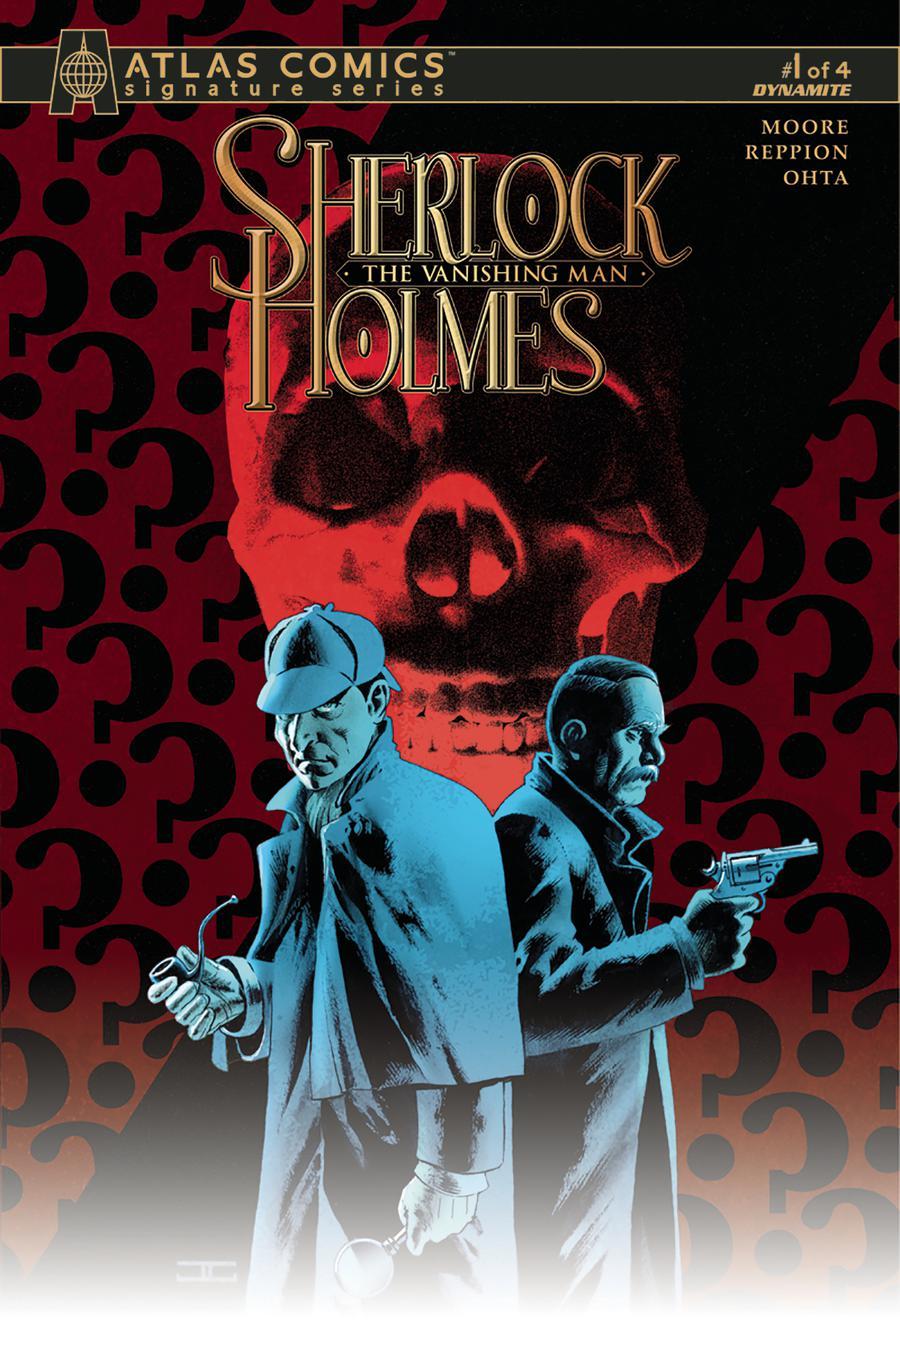 Sherlock Holmes Vanishing Man #1 Cover D Atlas Comics Signature Series Signed By John Cassaday